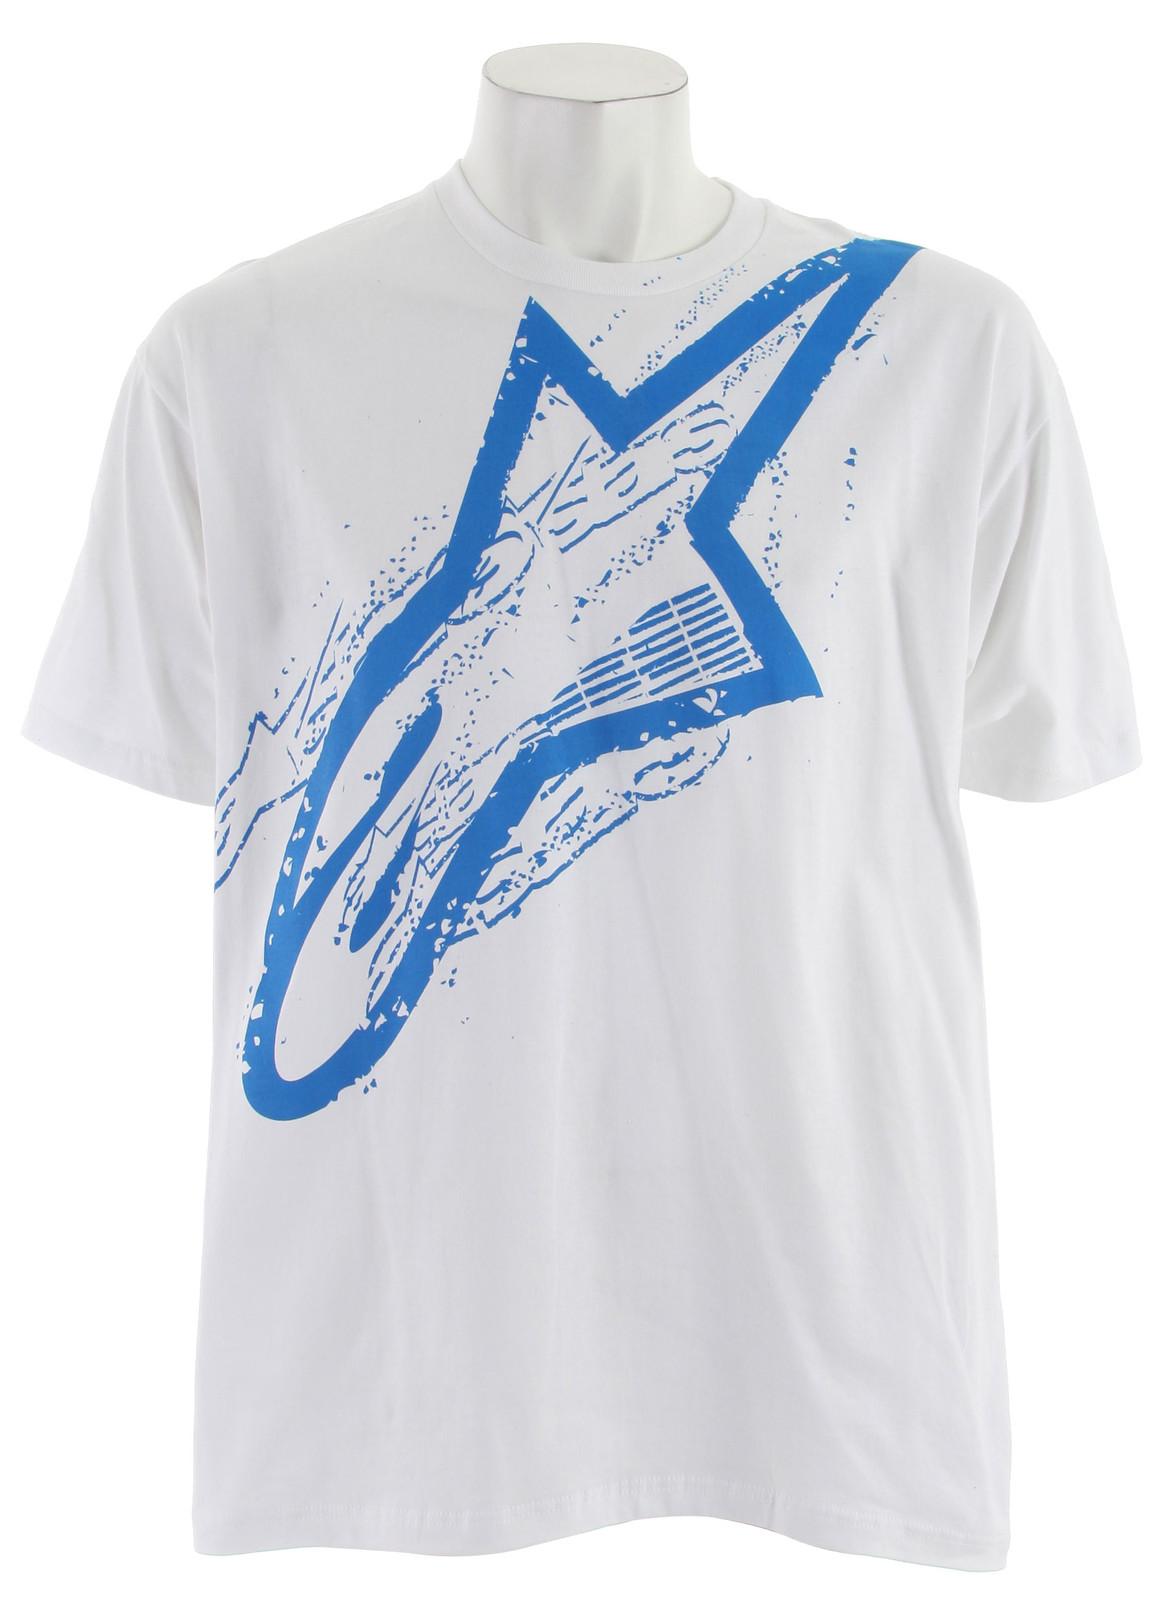 Alpinestars Envision T-Shirt White  alpinestar-envison-t-wht-11.jpg